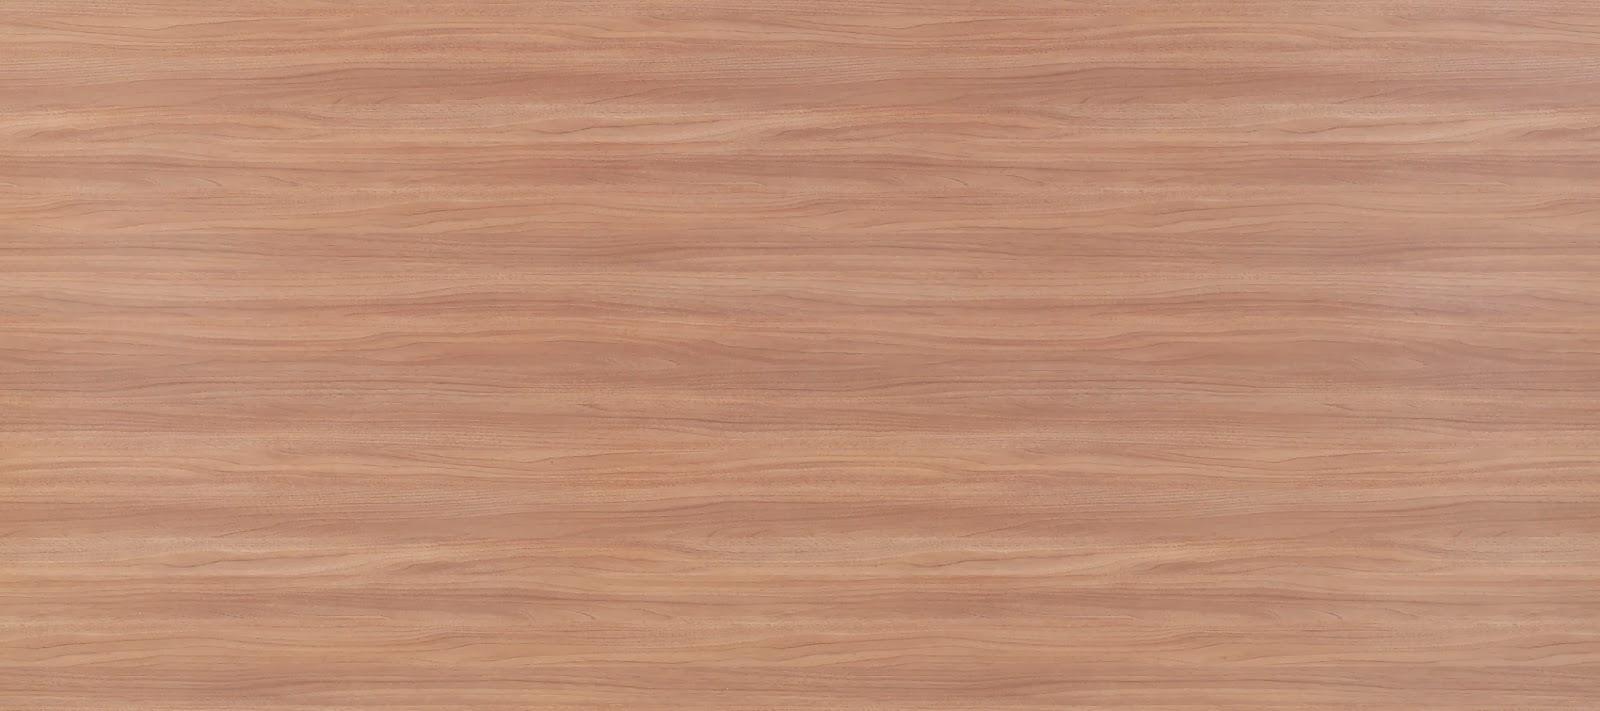 ... текстуры дерева дсп ламинат текстуры: texturend.blogspot.com/2013/11/blog-post_4374.html